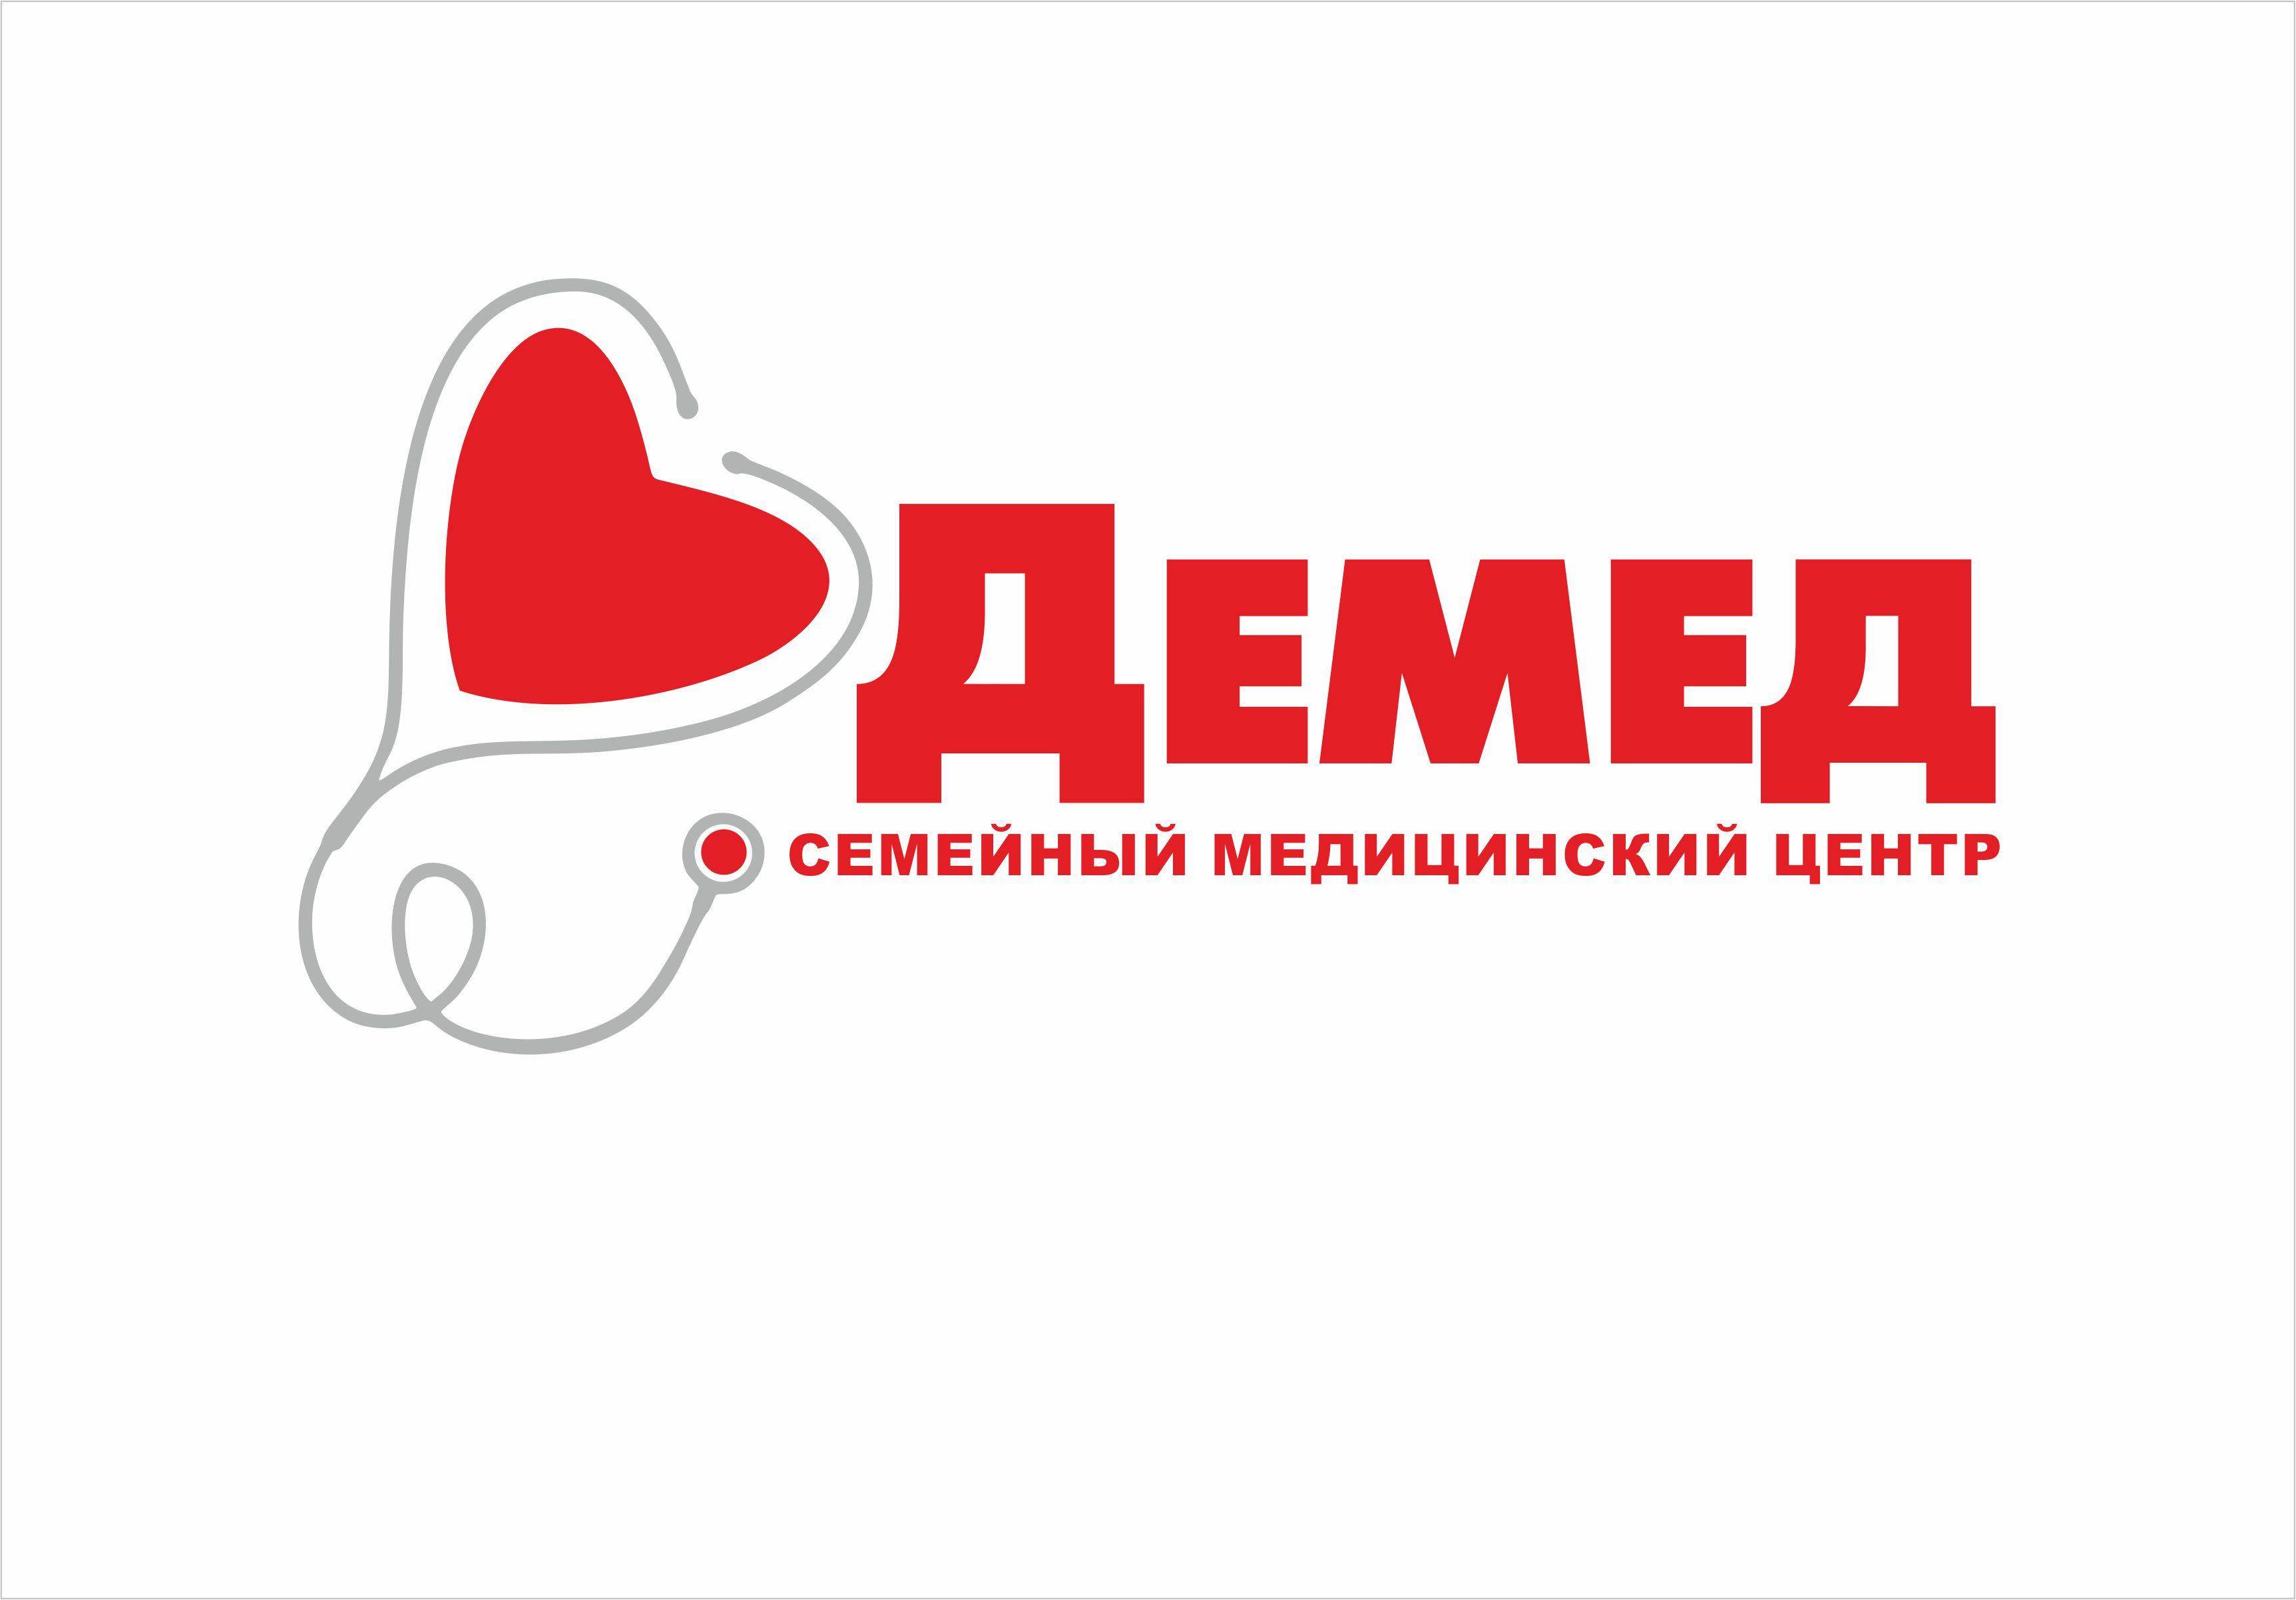 Логотип медицинского центра фото f_7945dce48786511a.jpg